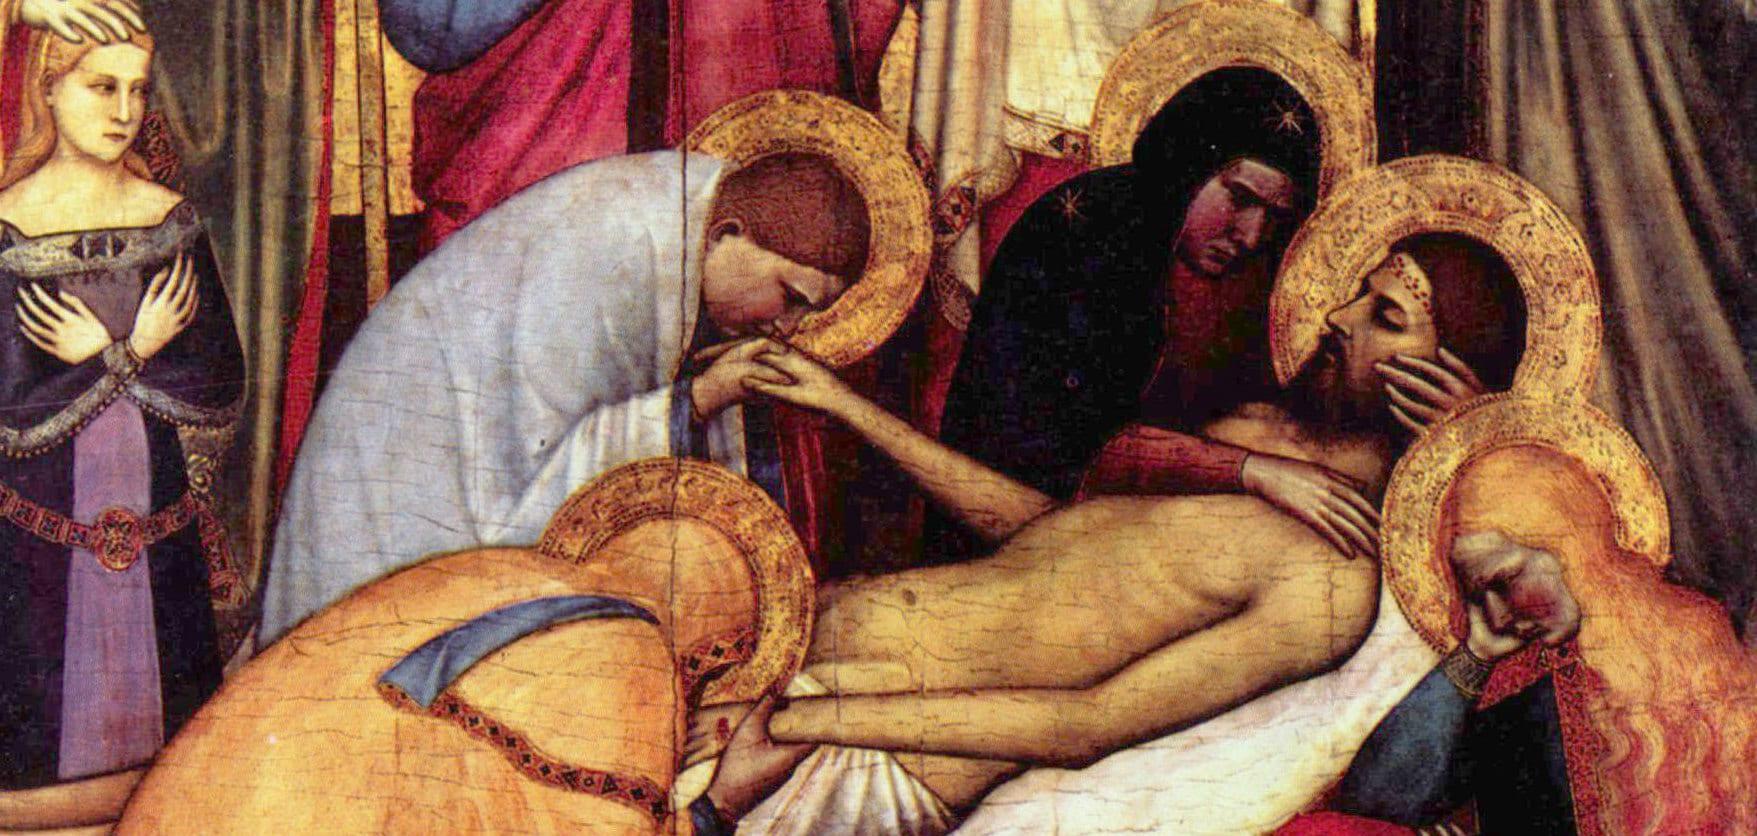 understanding the sacrifice of the mass cross death resurrection re-presentation pentecost calvary